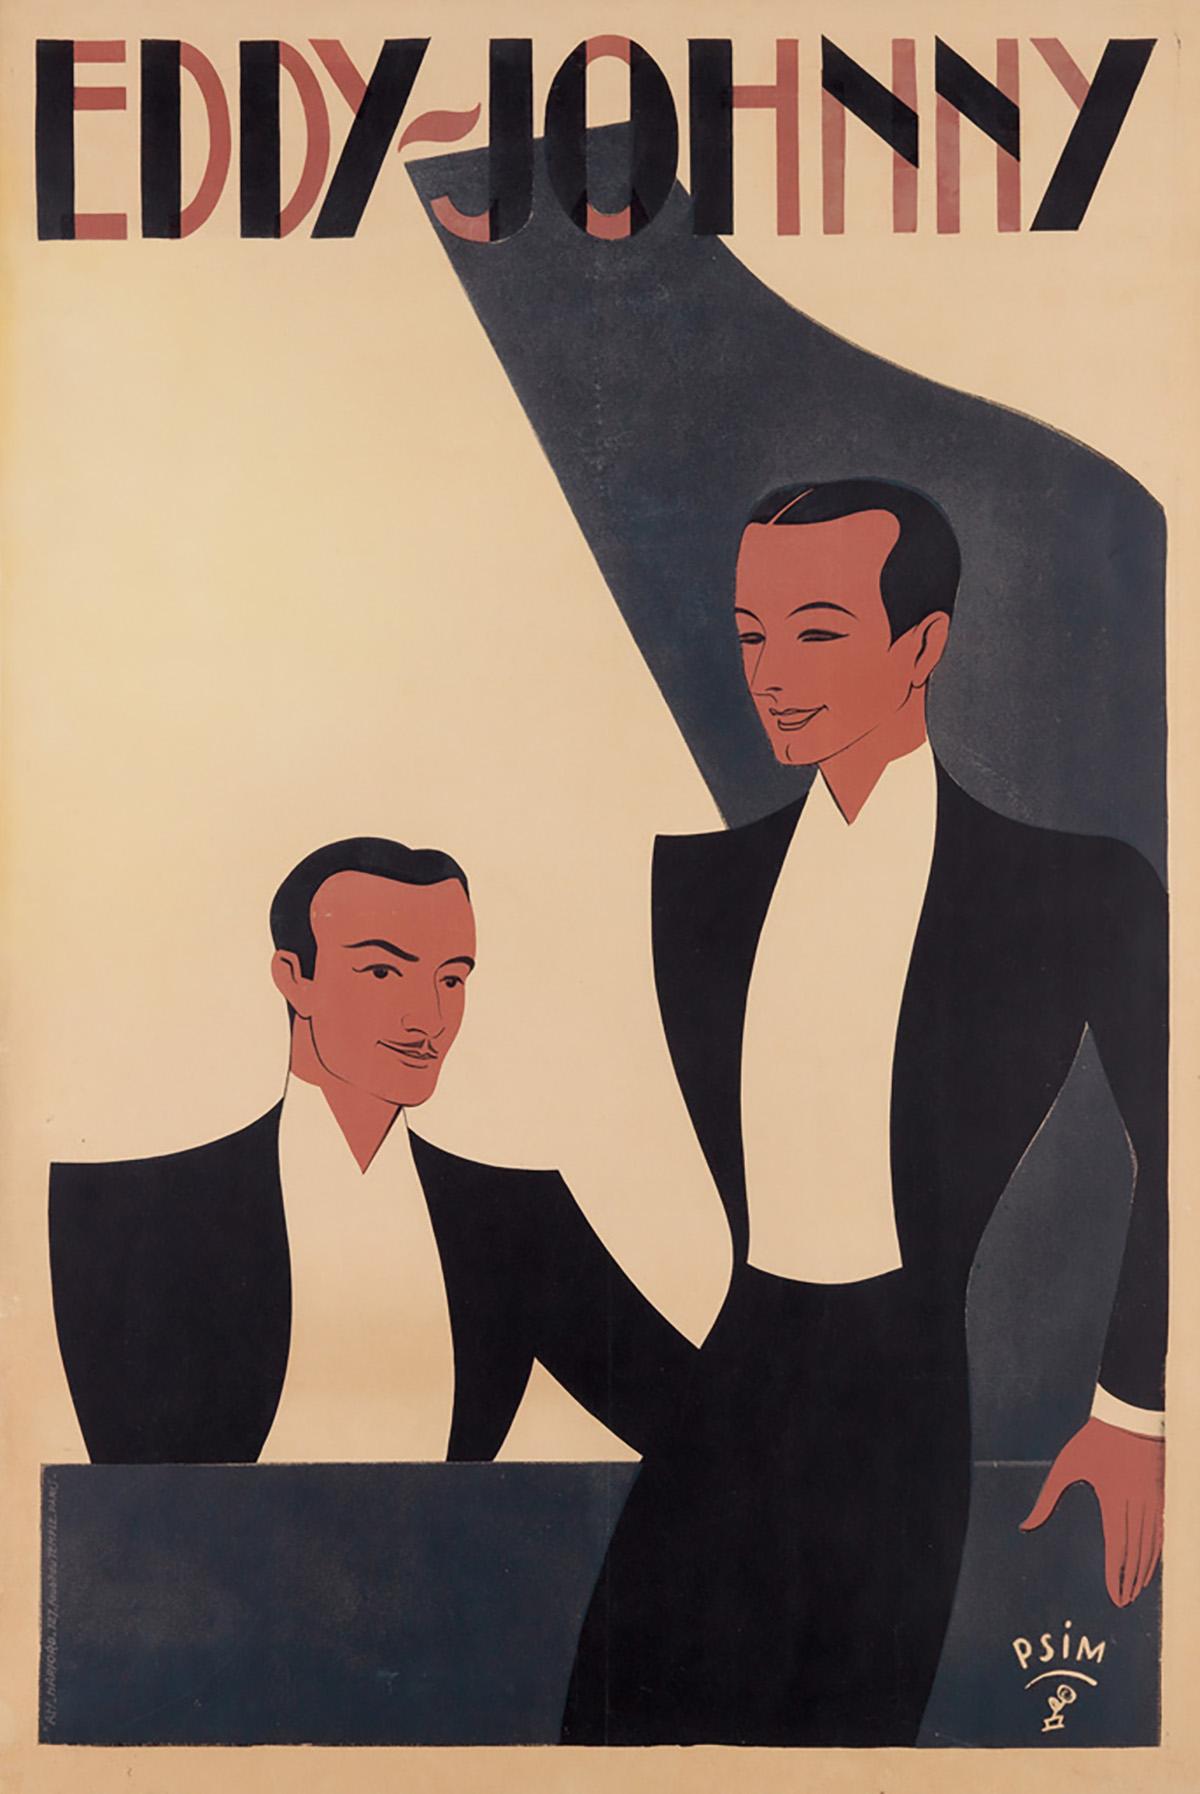 PSIM (DATE UNKNOWN).  EDDY - JOHNNY. 1938. 46¾x31¾ inches, 118¾x 80½ cm. Harford, Paris.